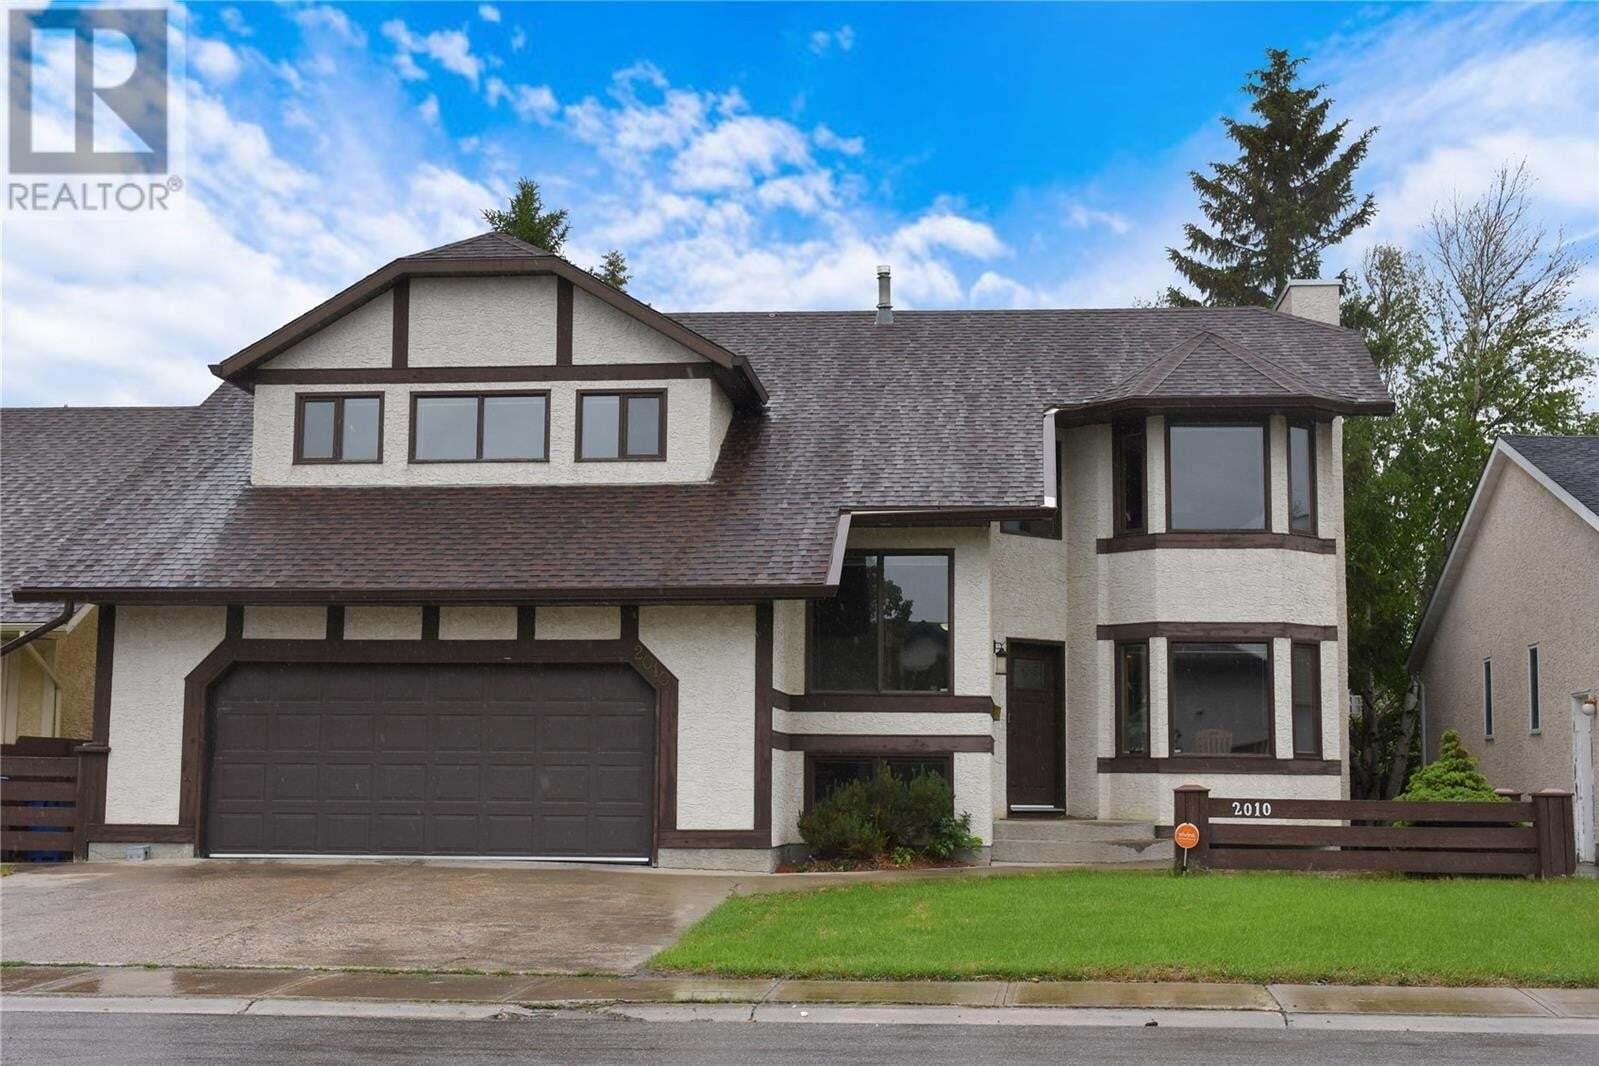 House for sale at 2010 Assiniboine Ave E Regina Saskatchewan - MLS: SK813817